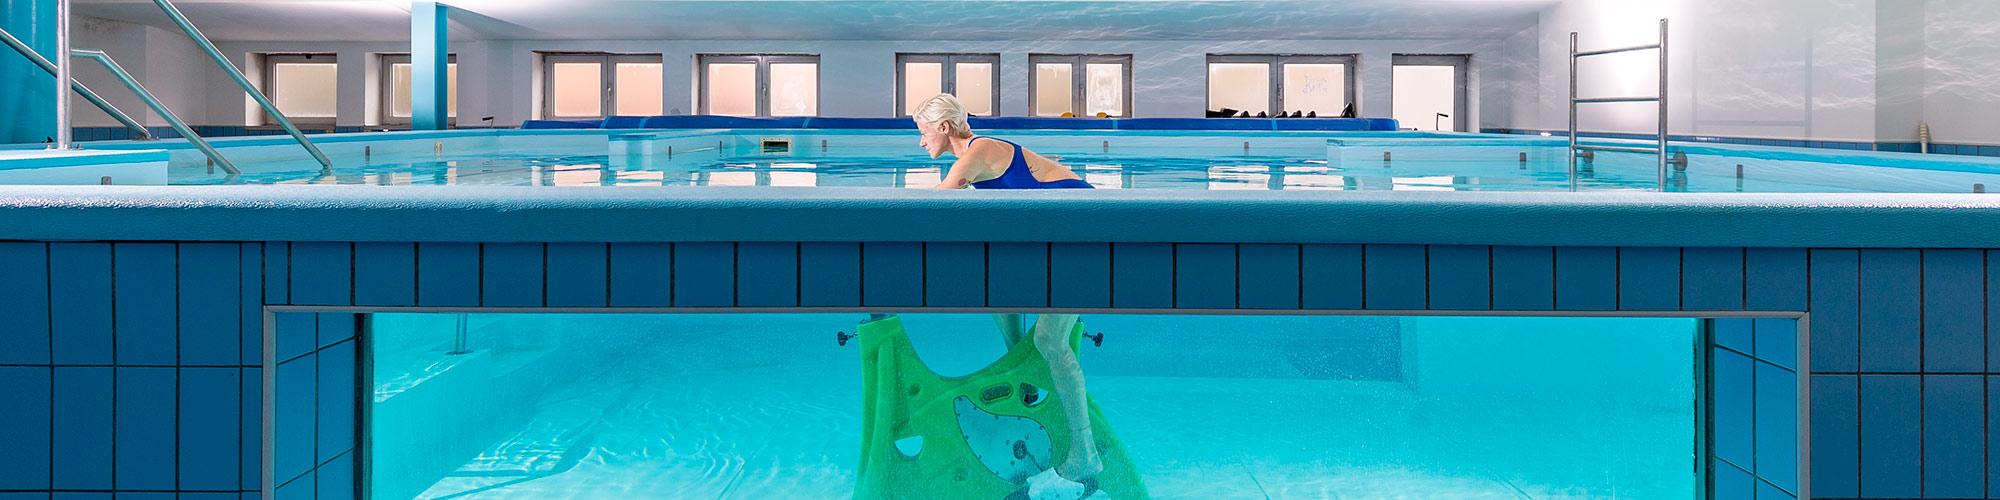 Mal di schiena e i benefici di una riabilitazione in acqua